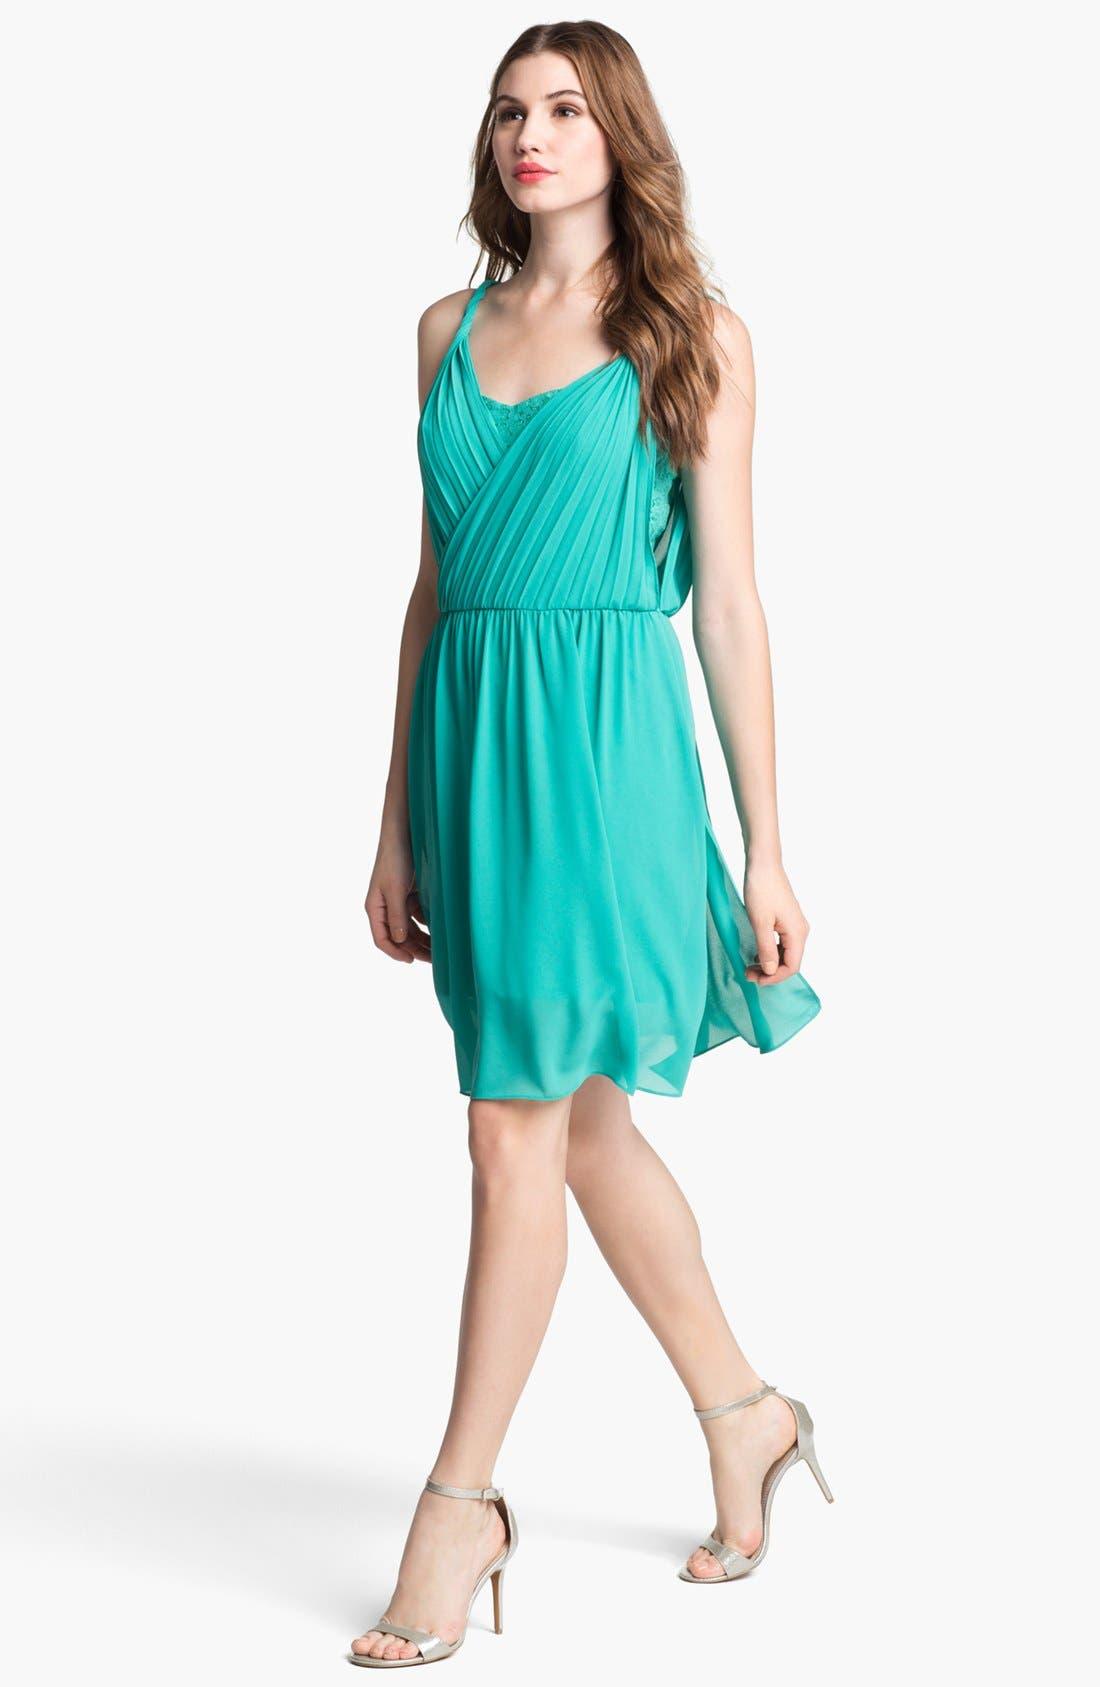 Alternate Image 1 Selected - Jessica Simpson Lace & Chiffon Surplice Dress